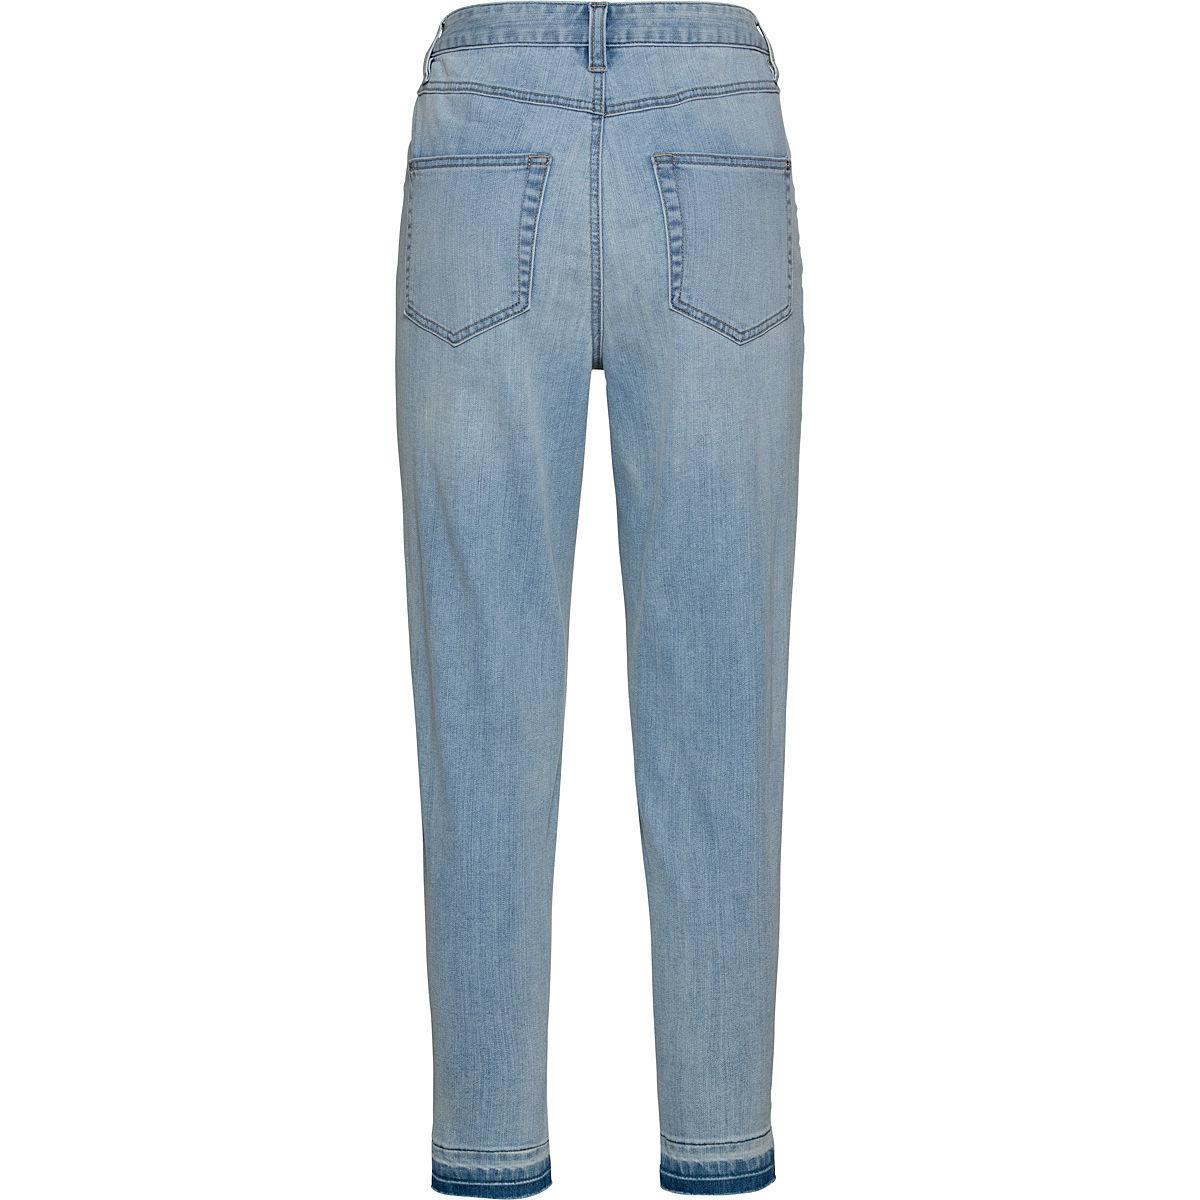 Bild 2 von Adagio Damen 7/8 Skinny-Jeans